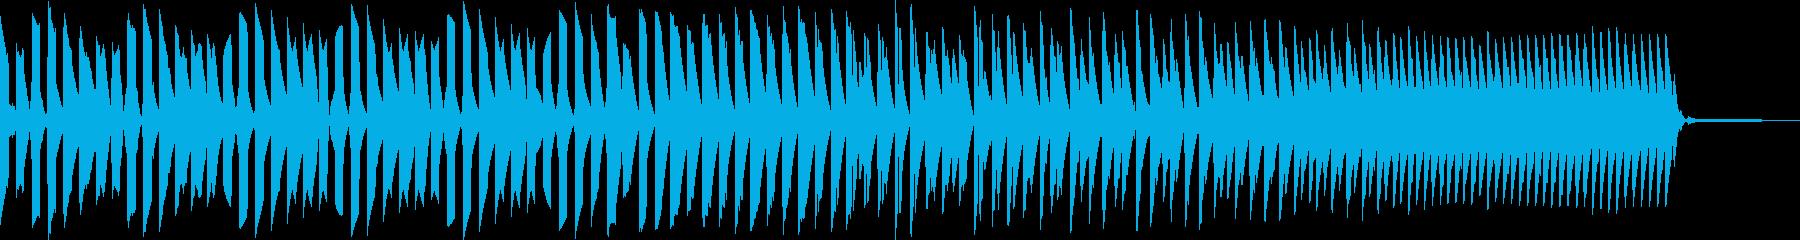 AMGアナログFX4の再生済みの波形